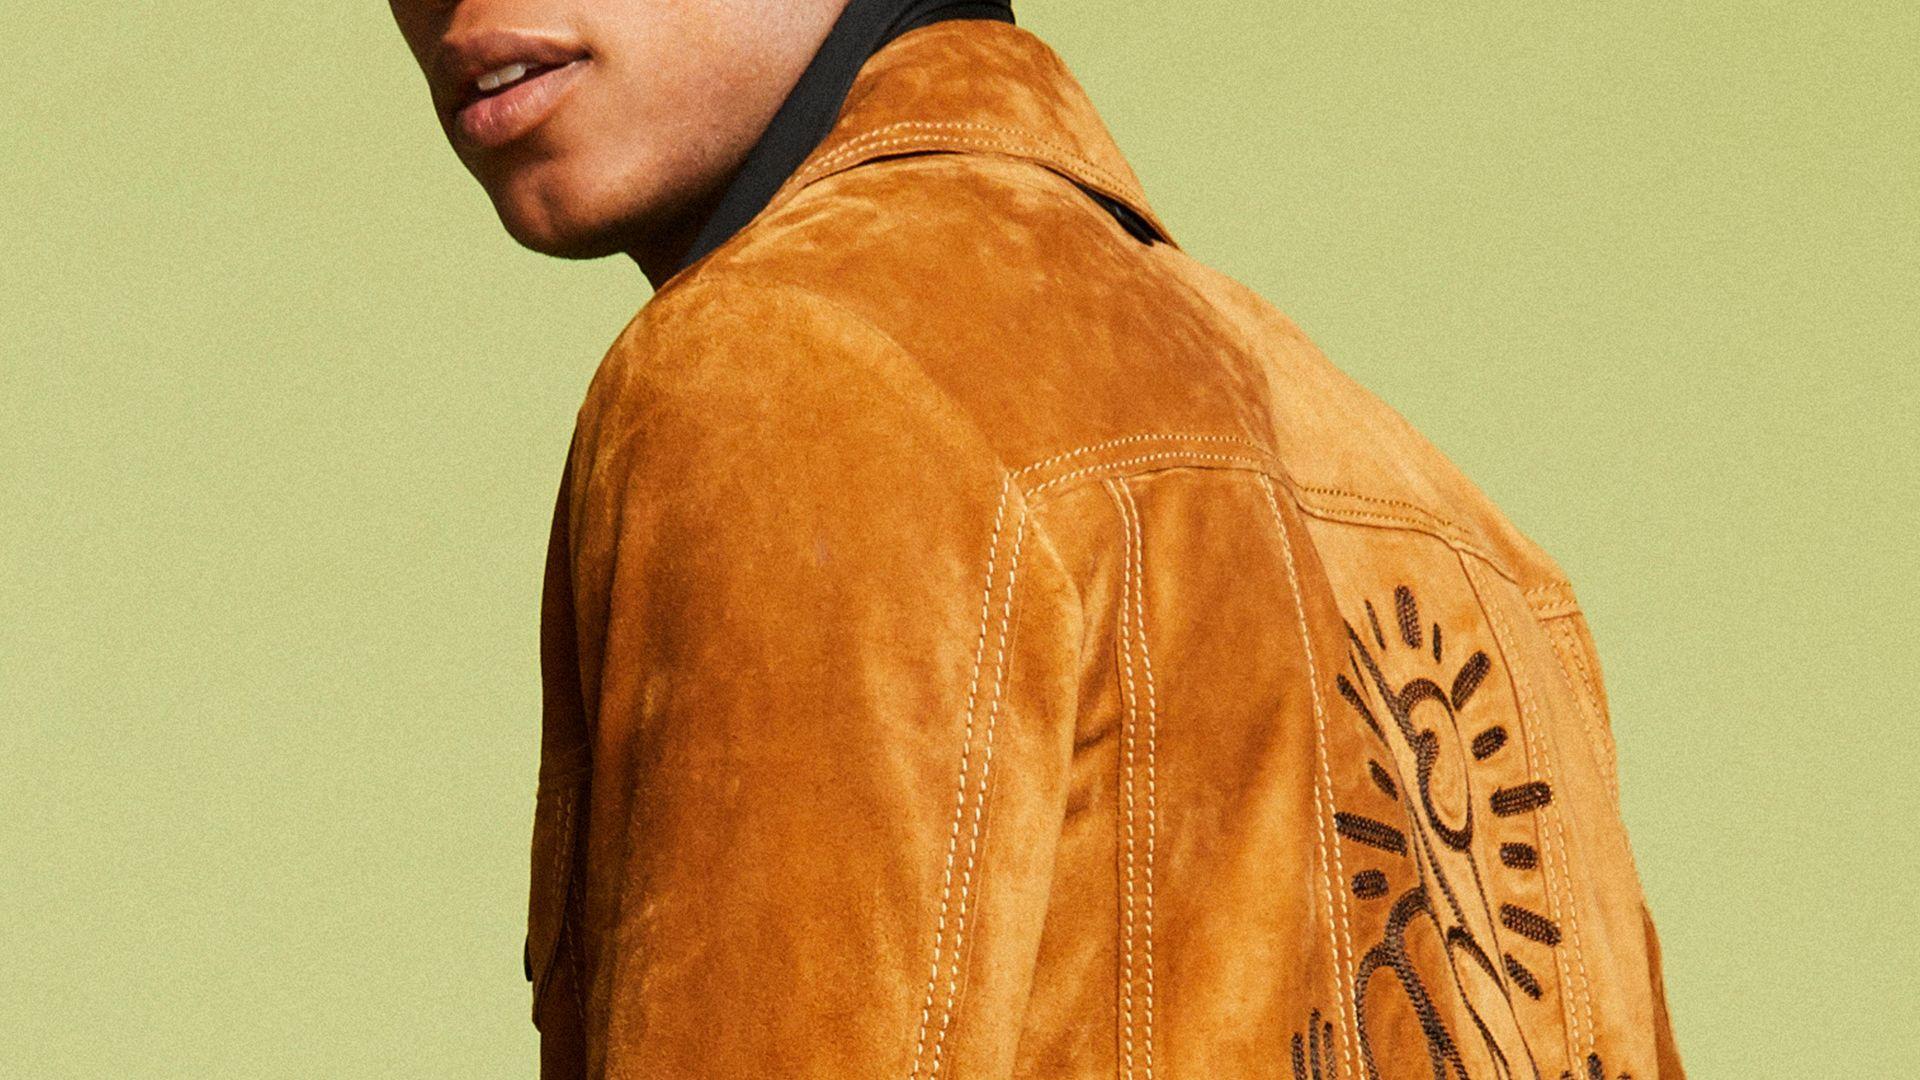 Trend Report: 10 stylish ways to wear suede